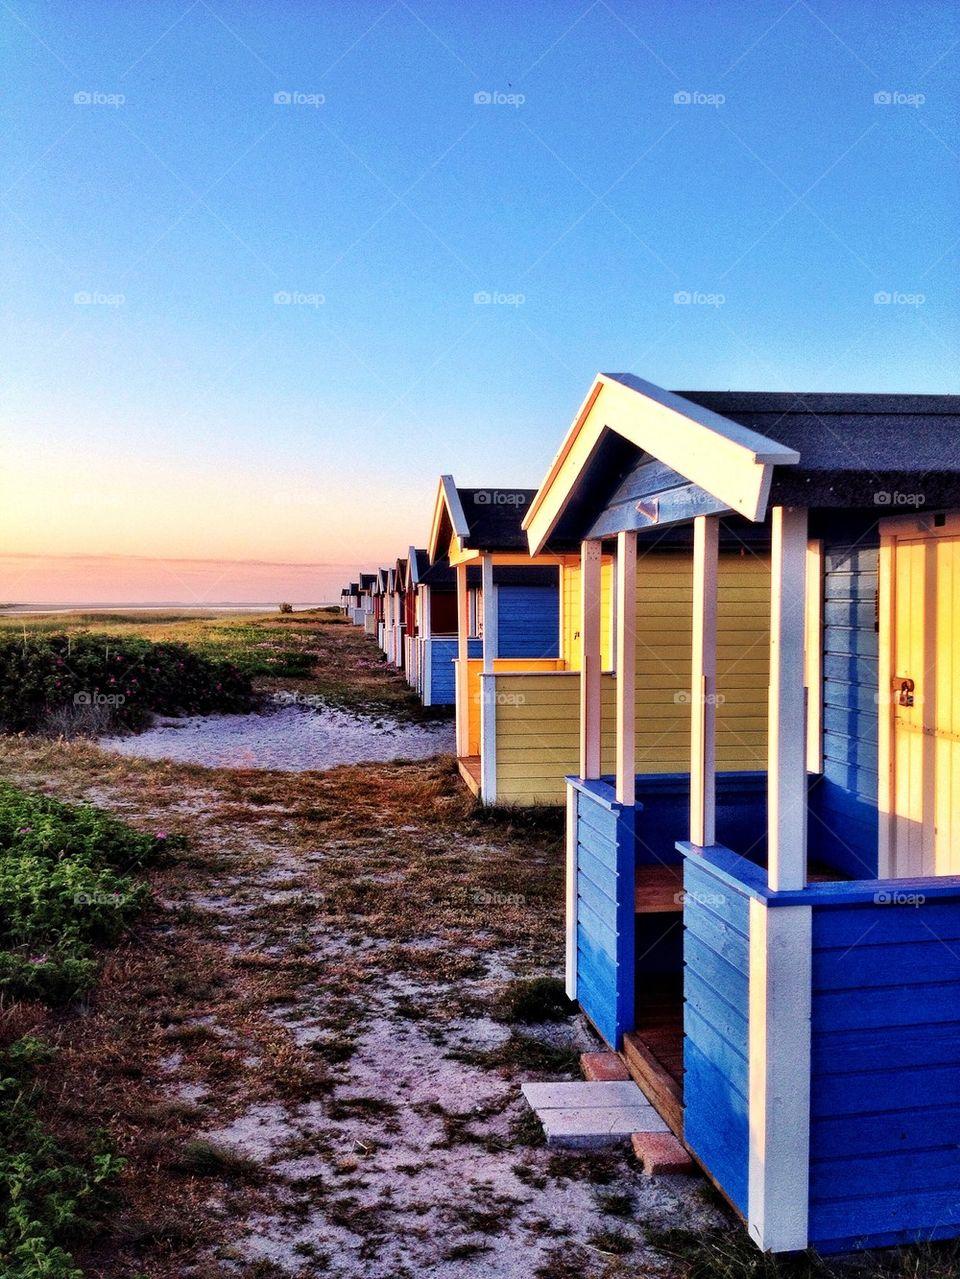 Beach huts in sunset